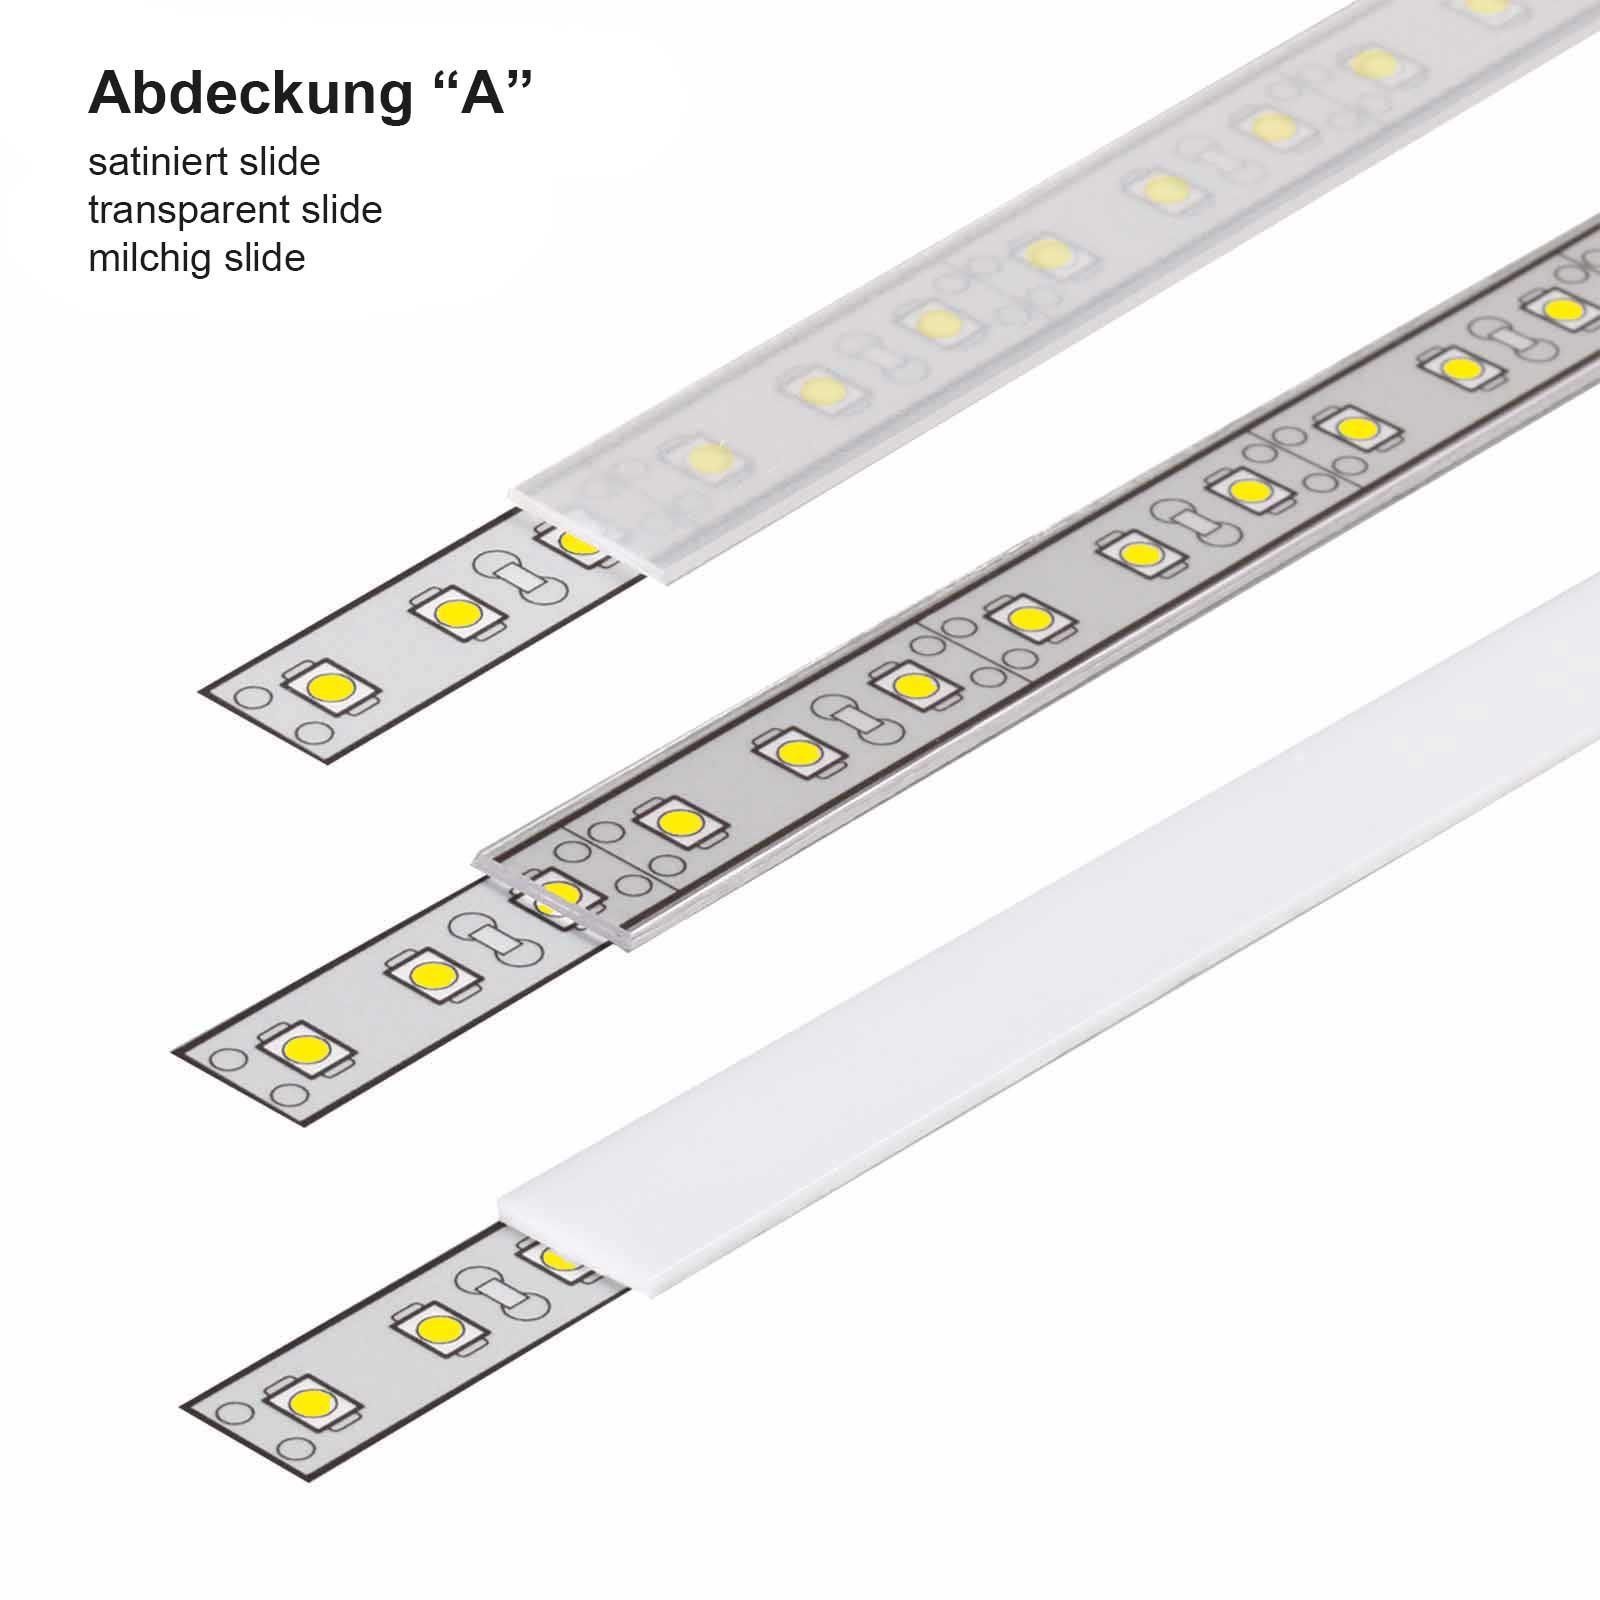 1-2 Meter LED Aufbauprofil SLIM (MI) - U-Profil - Abdeckungsarten